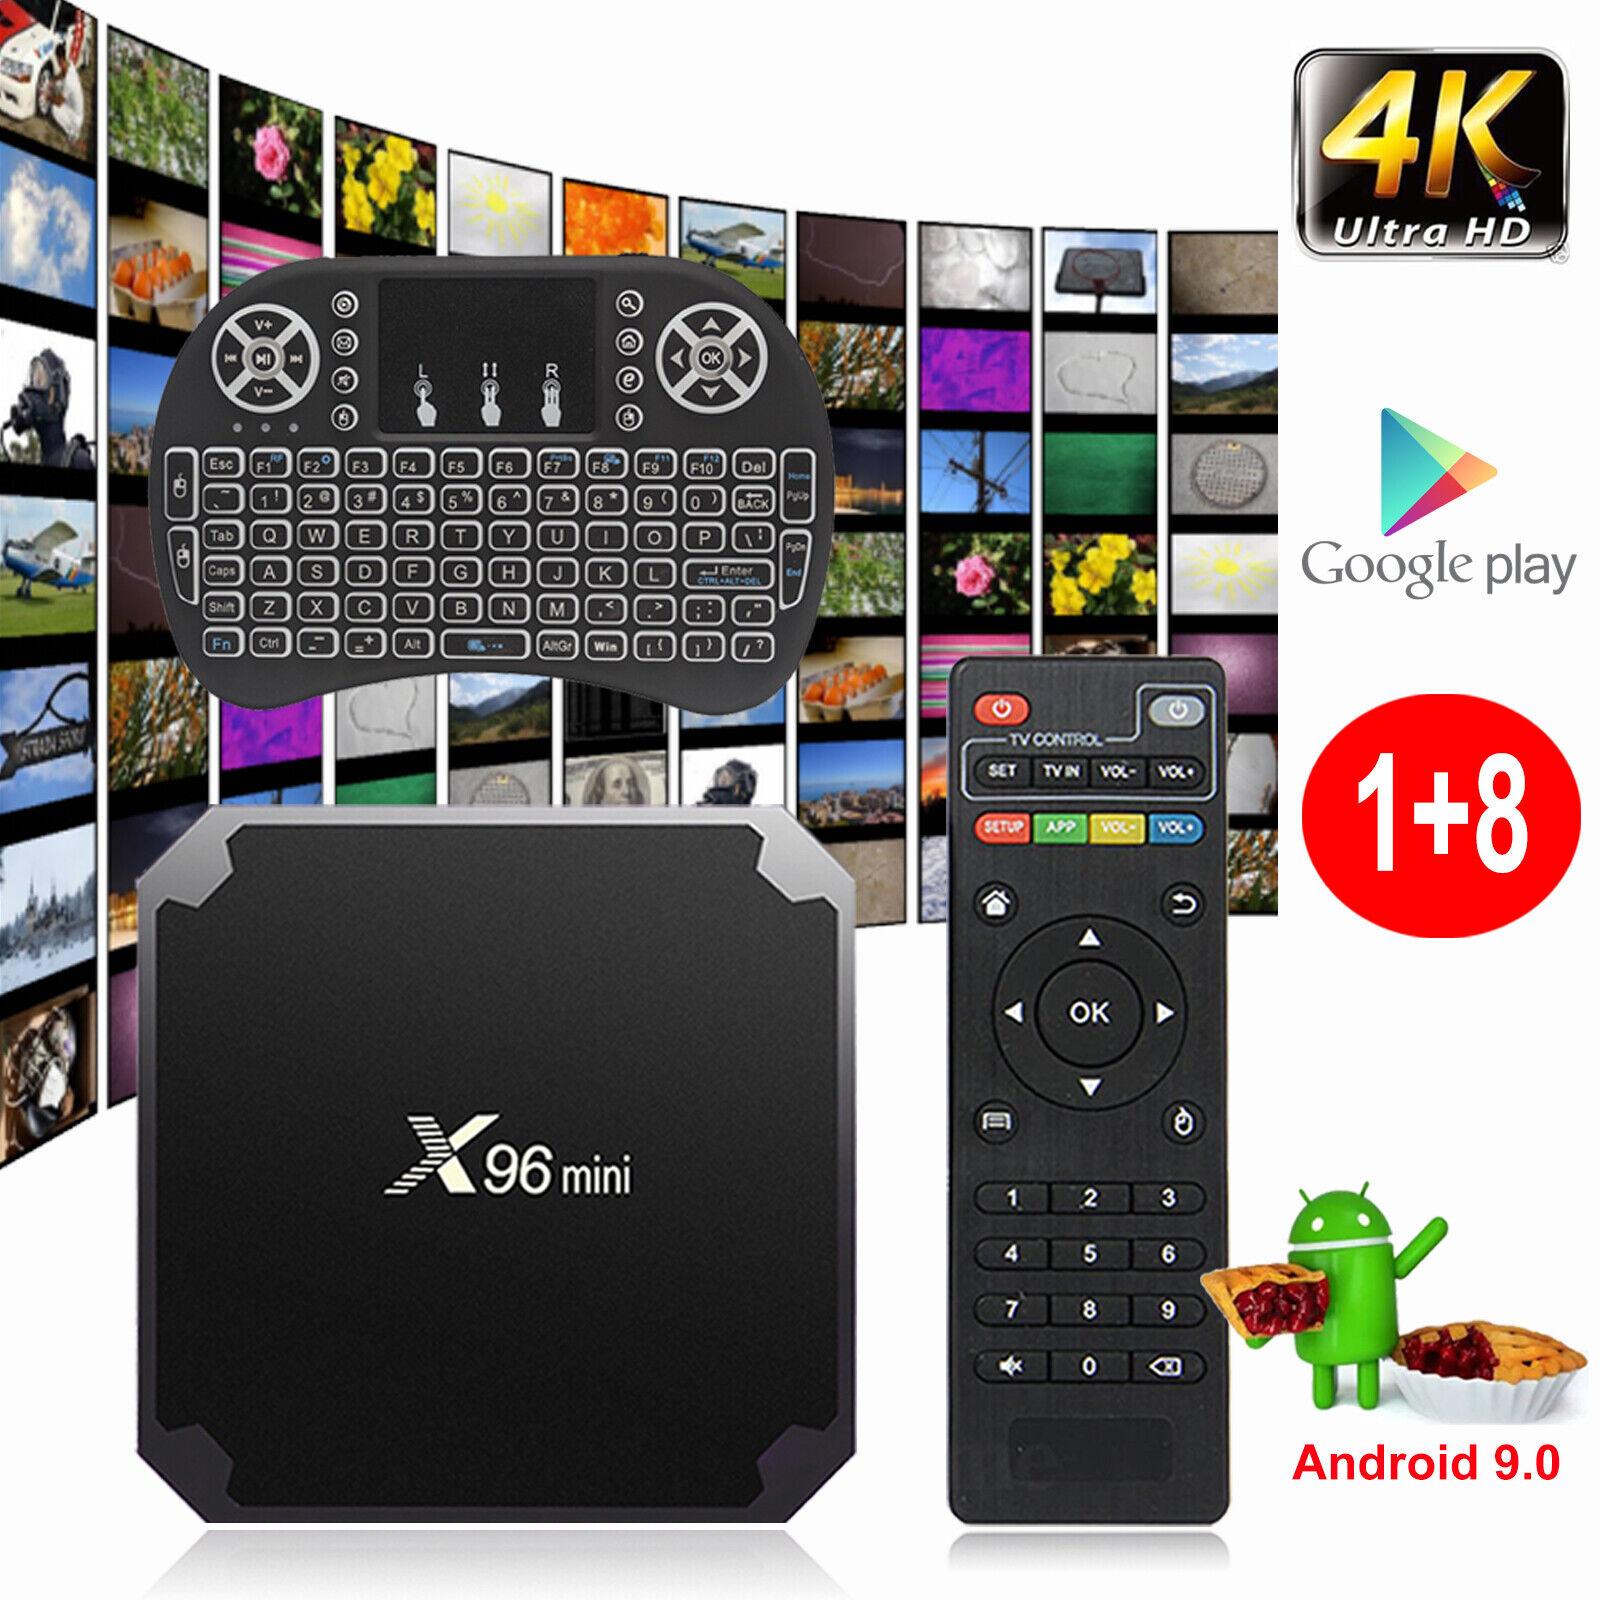 X96MINI Android 9.0 Pie Quad Core 4K UHD Smart TV BOX Amlogic H.265 3D Movies US